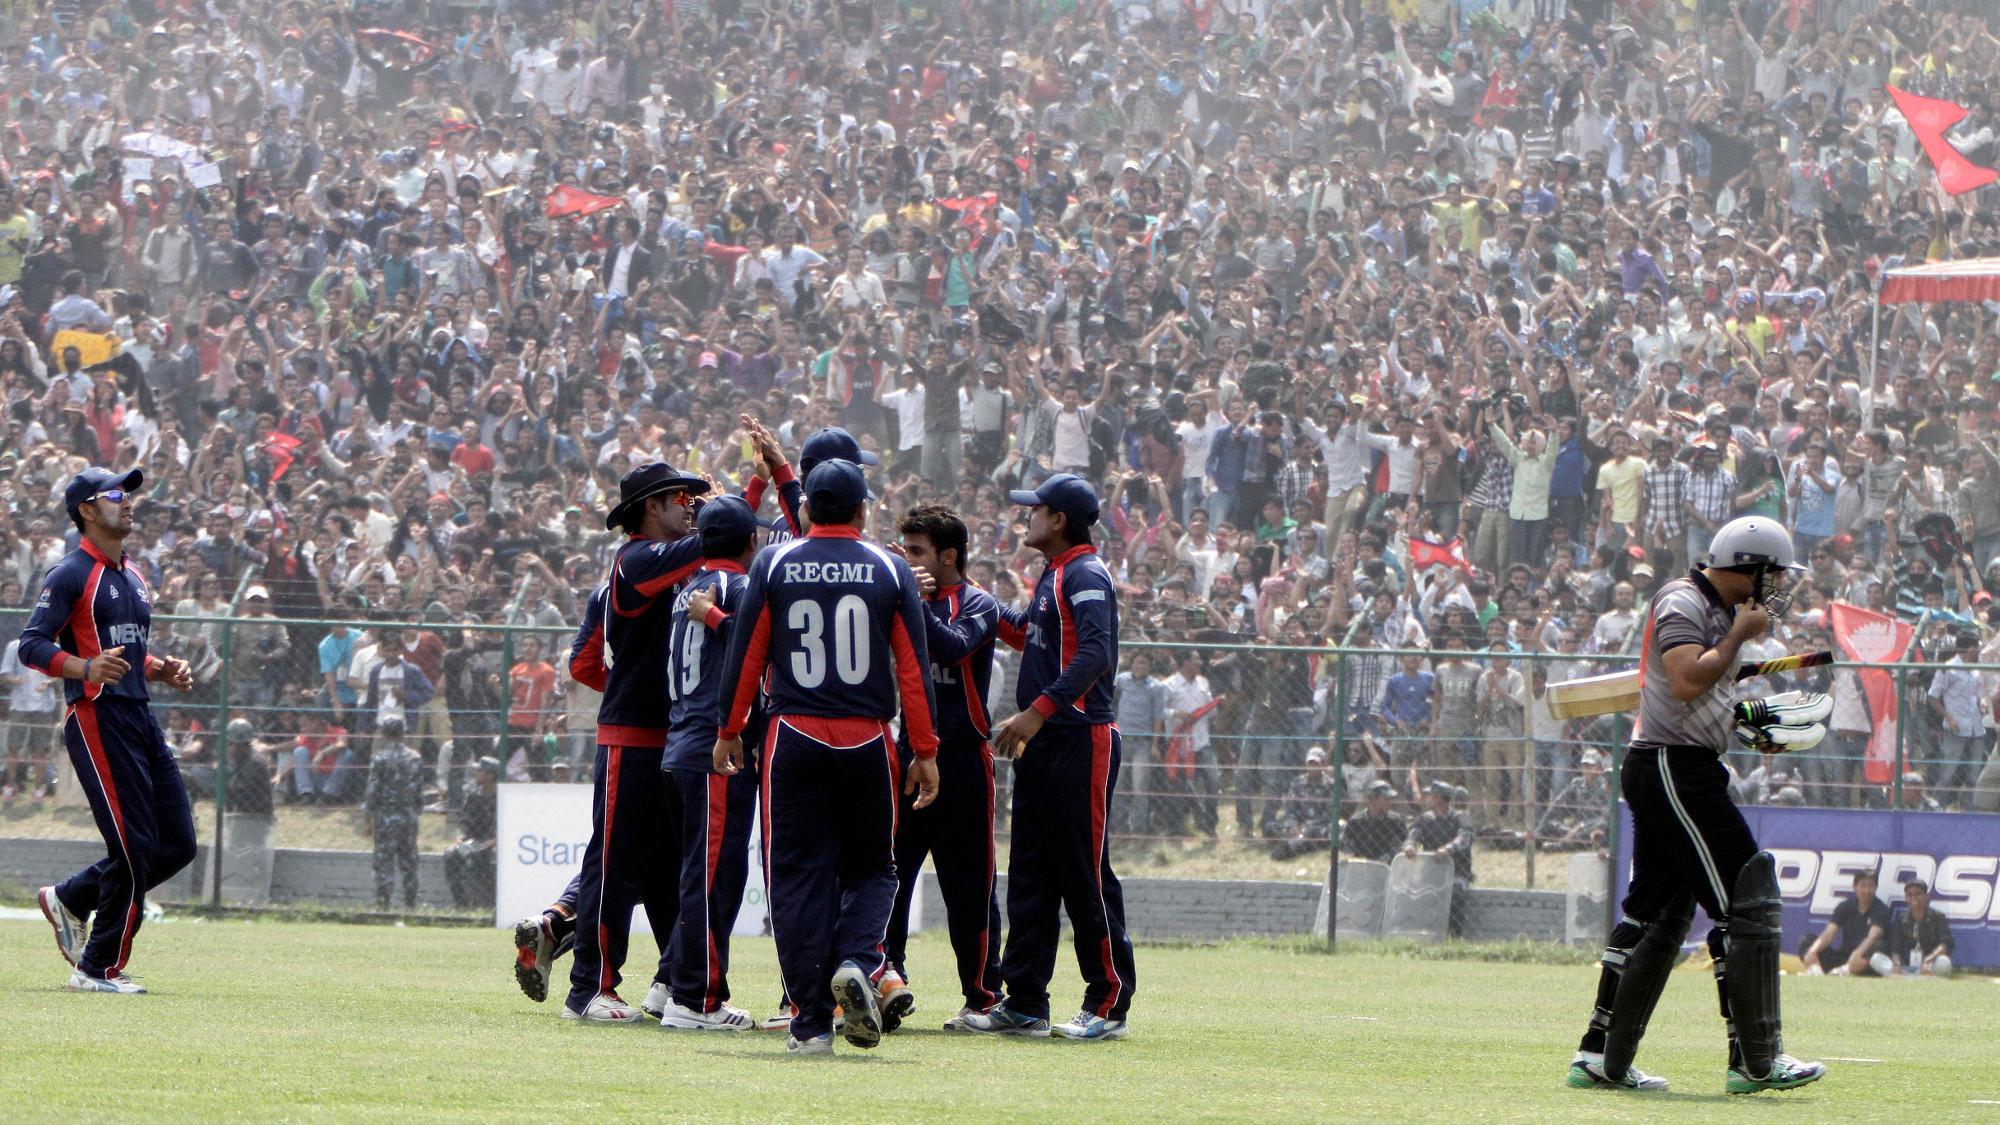 Nepalese Cricket